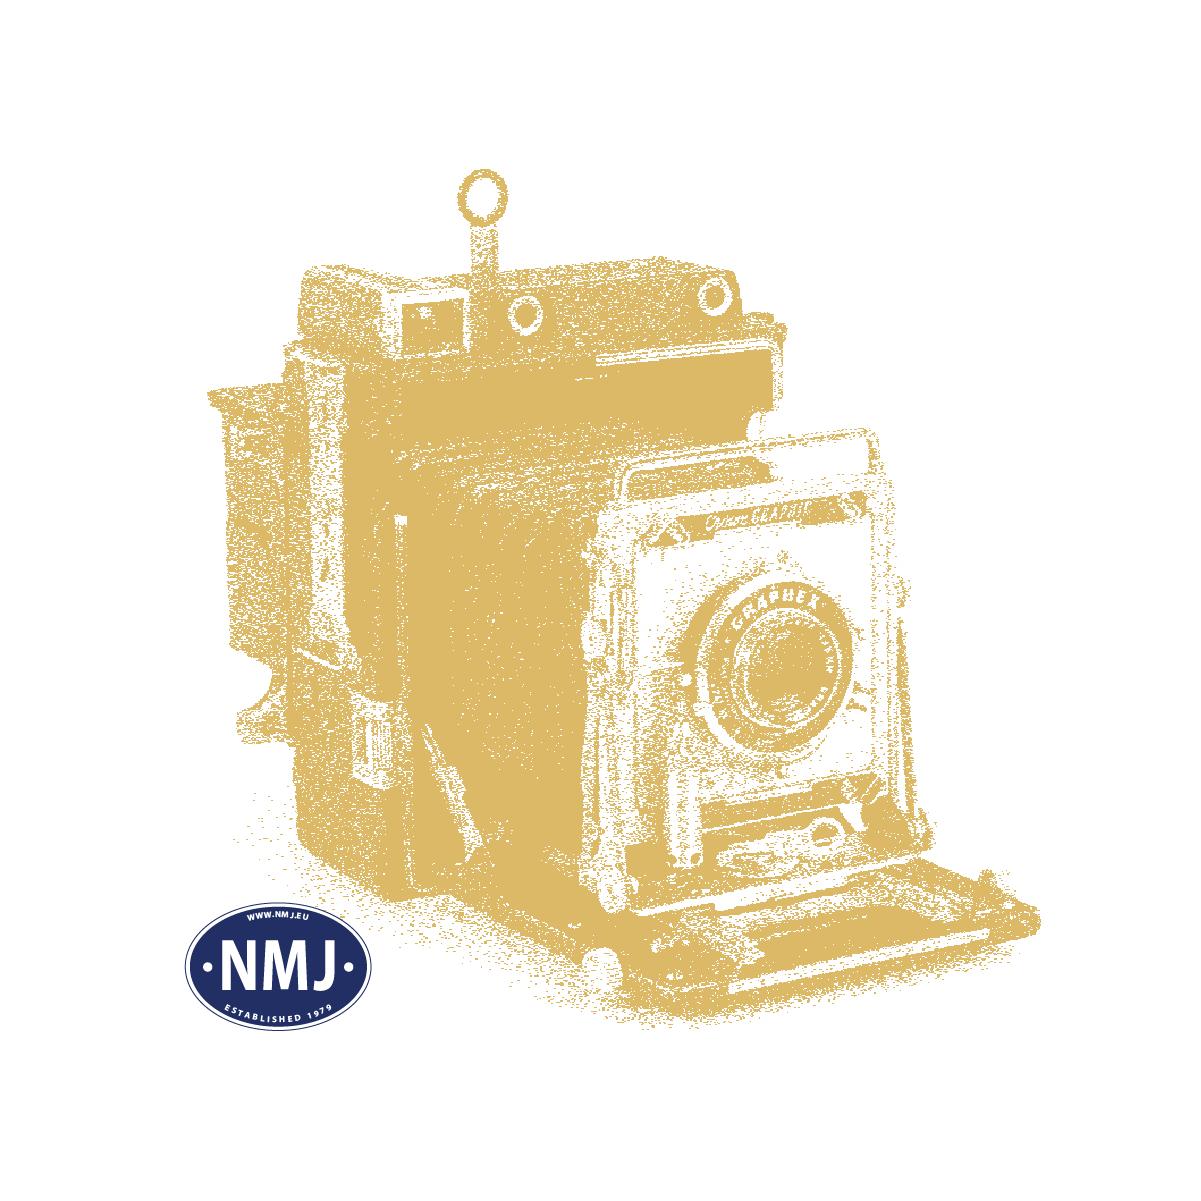 TRI22833 - NSB Rangierlok EL10.2505, rotbraun/Gammeldesign, DCC Digital